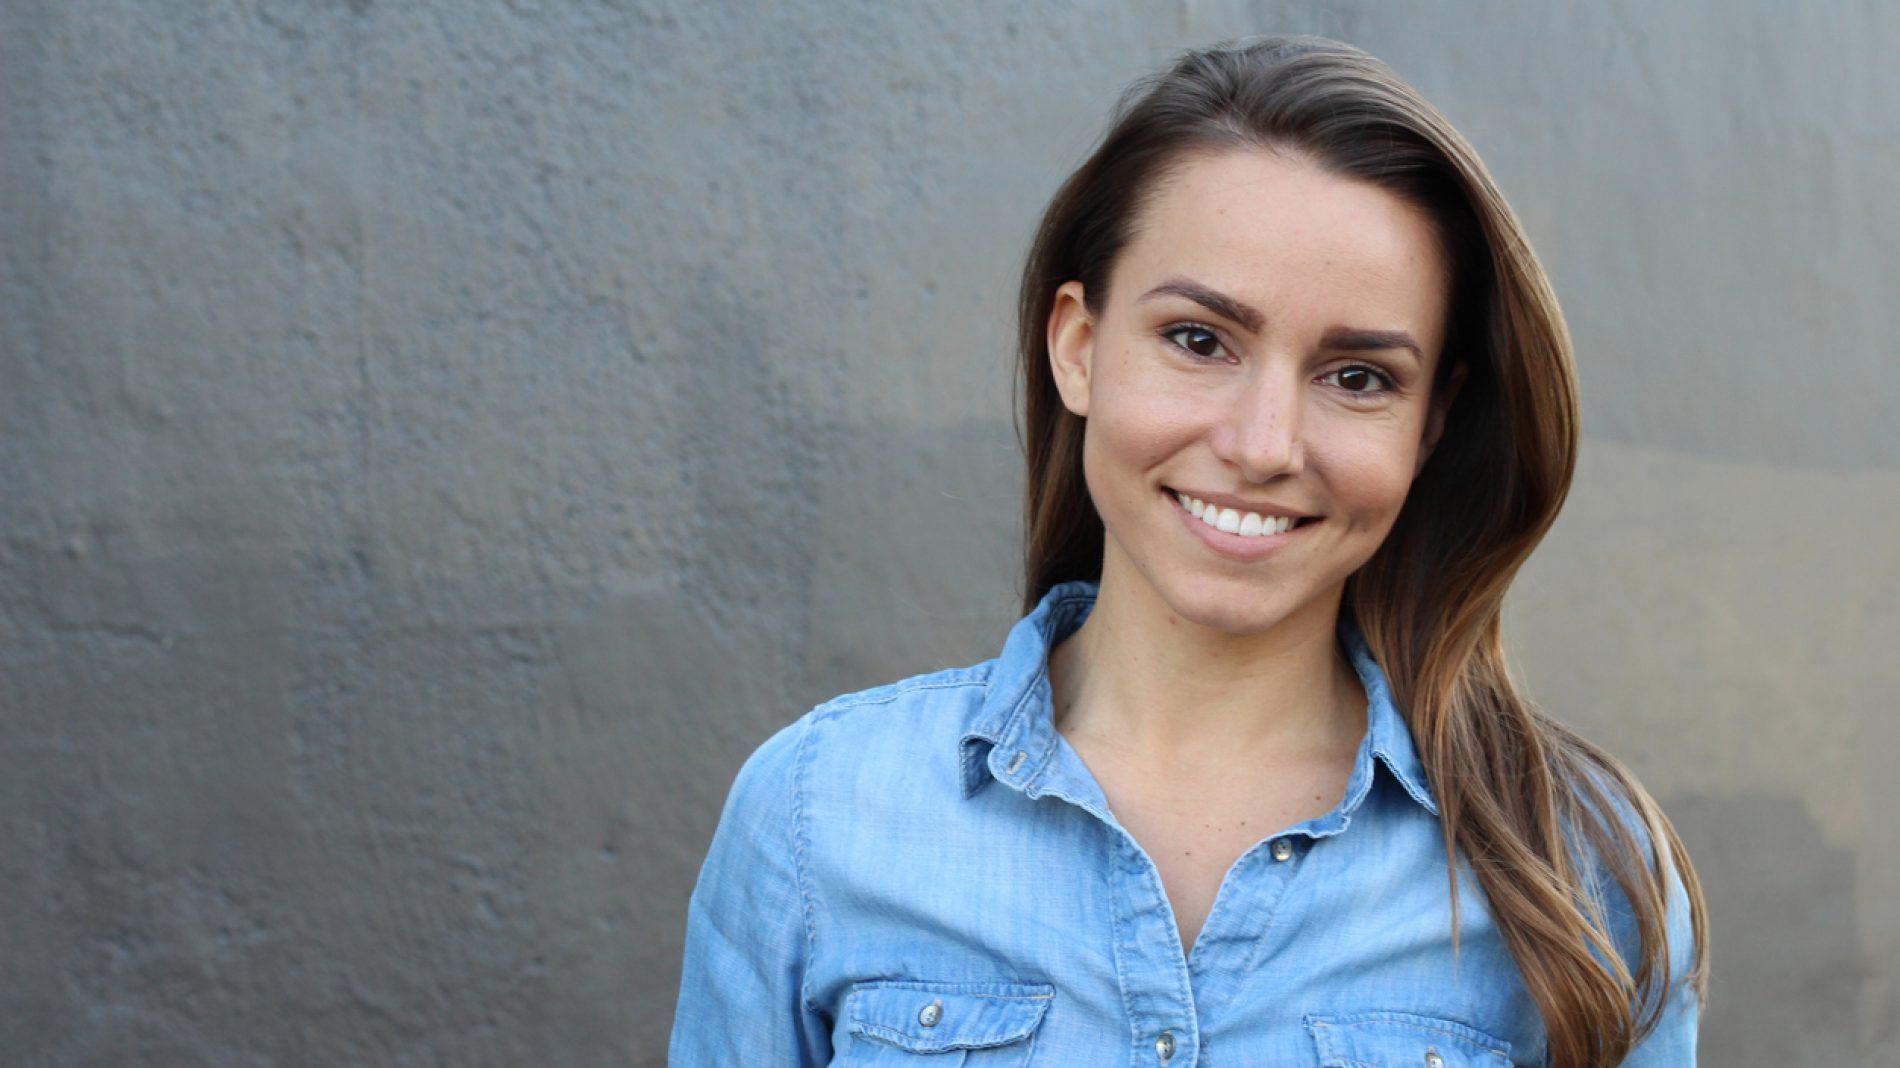 Beautiful woman in denim shirt smiling